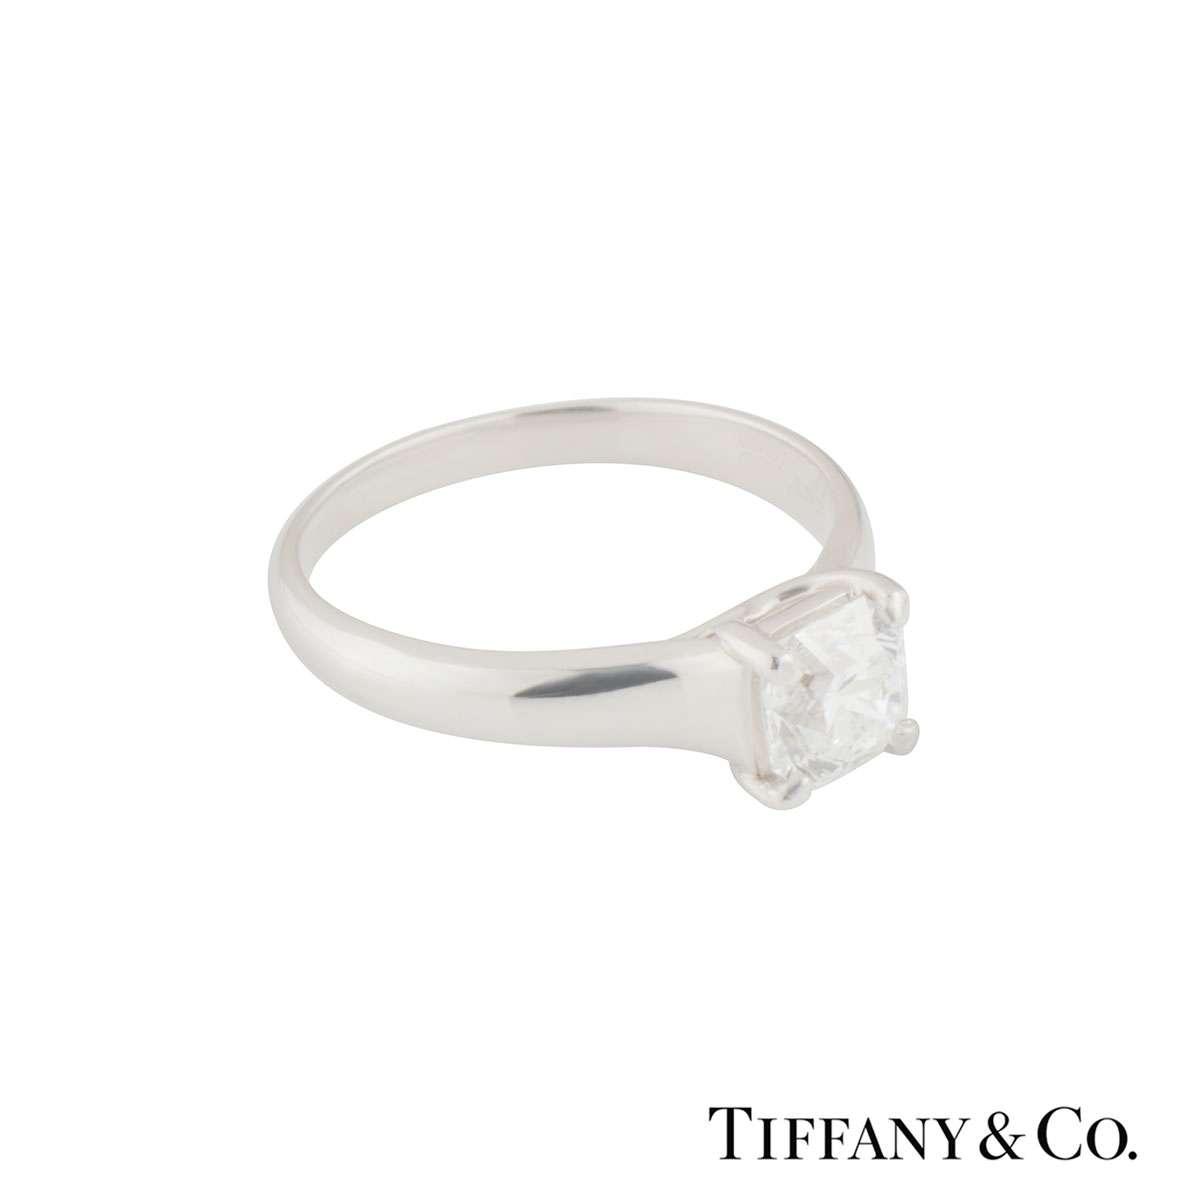 Tiffany & Co. Diamond Platinum Lucida Ring 1.19ct E/VS1